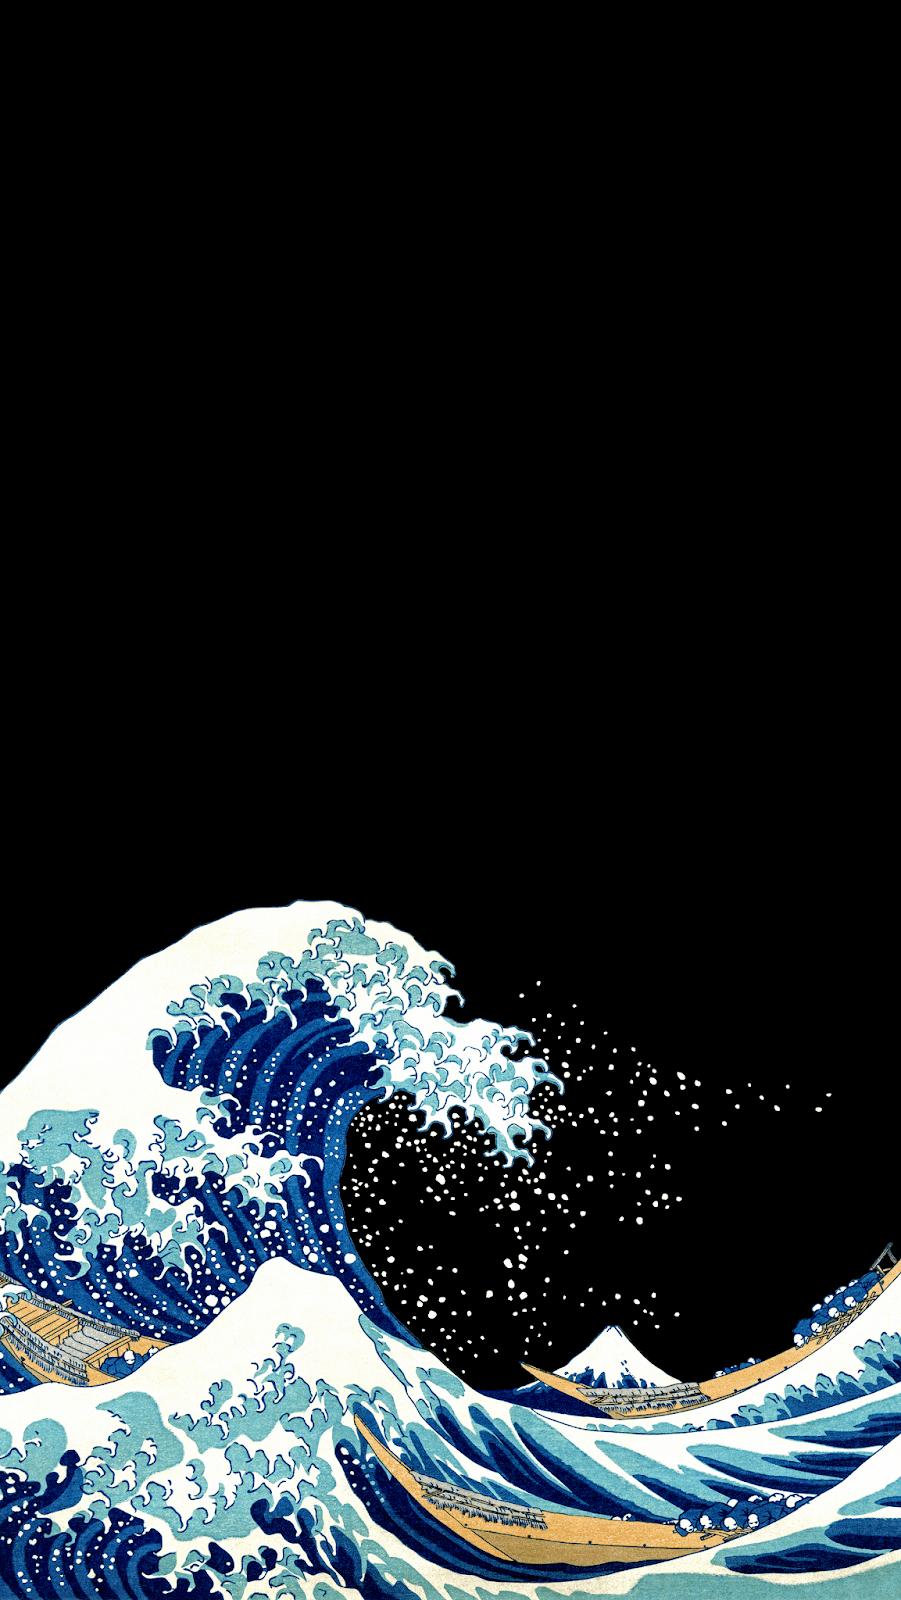 Aesthetic Wave Wallpaper : aesthetic, wallpaper, Aesthetic, Waves, Wallpapers, Wallpaper